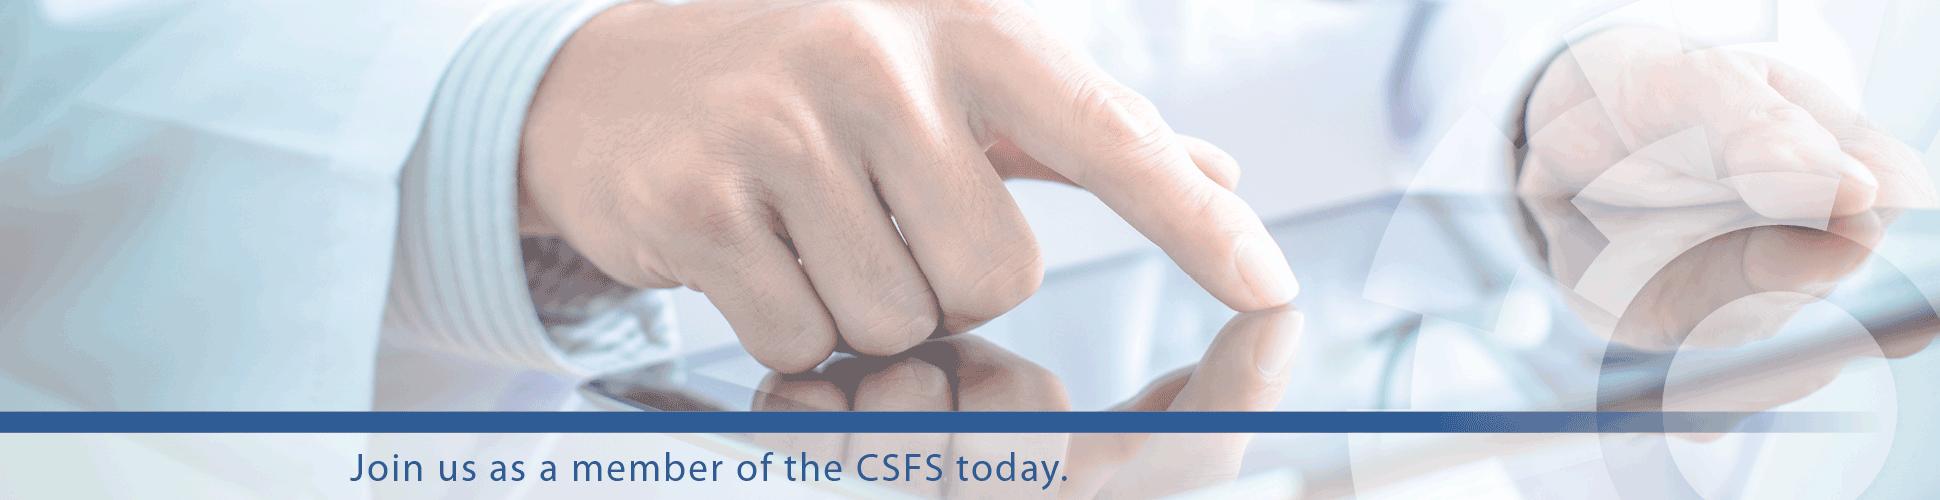 csfs-joinus-banner